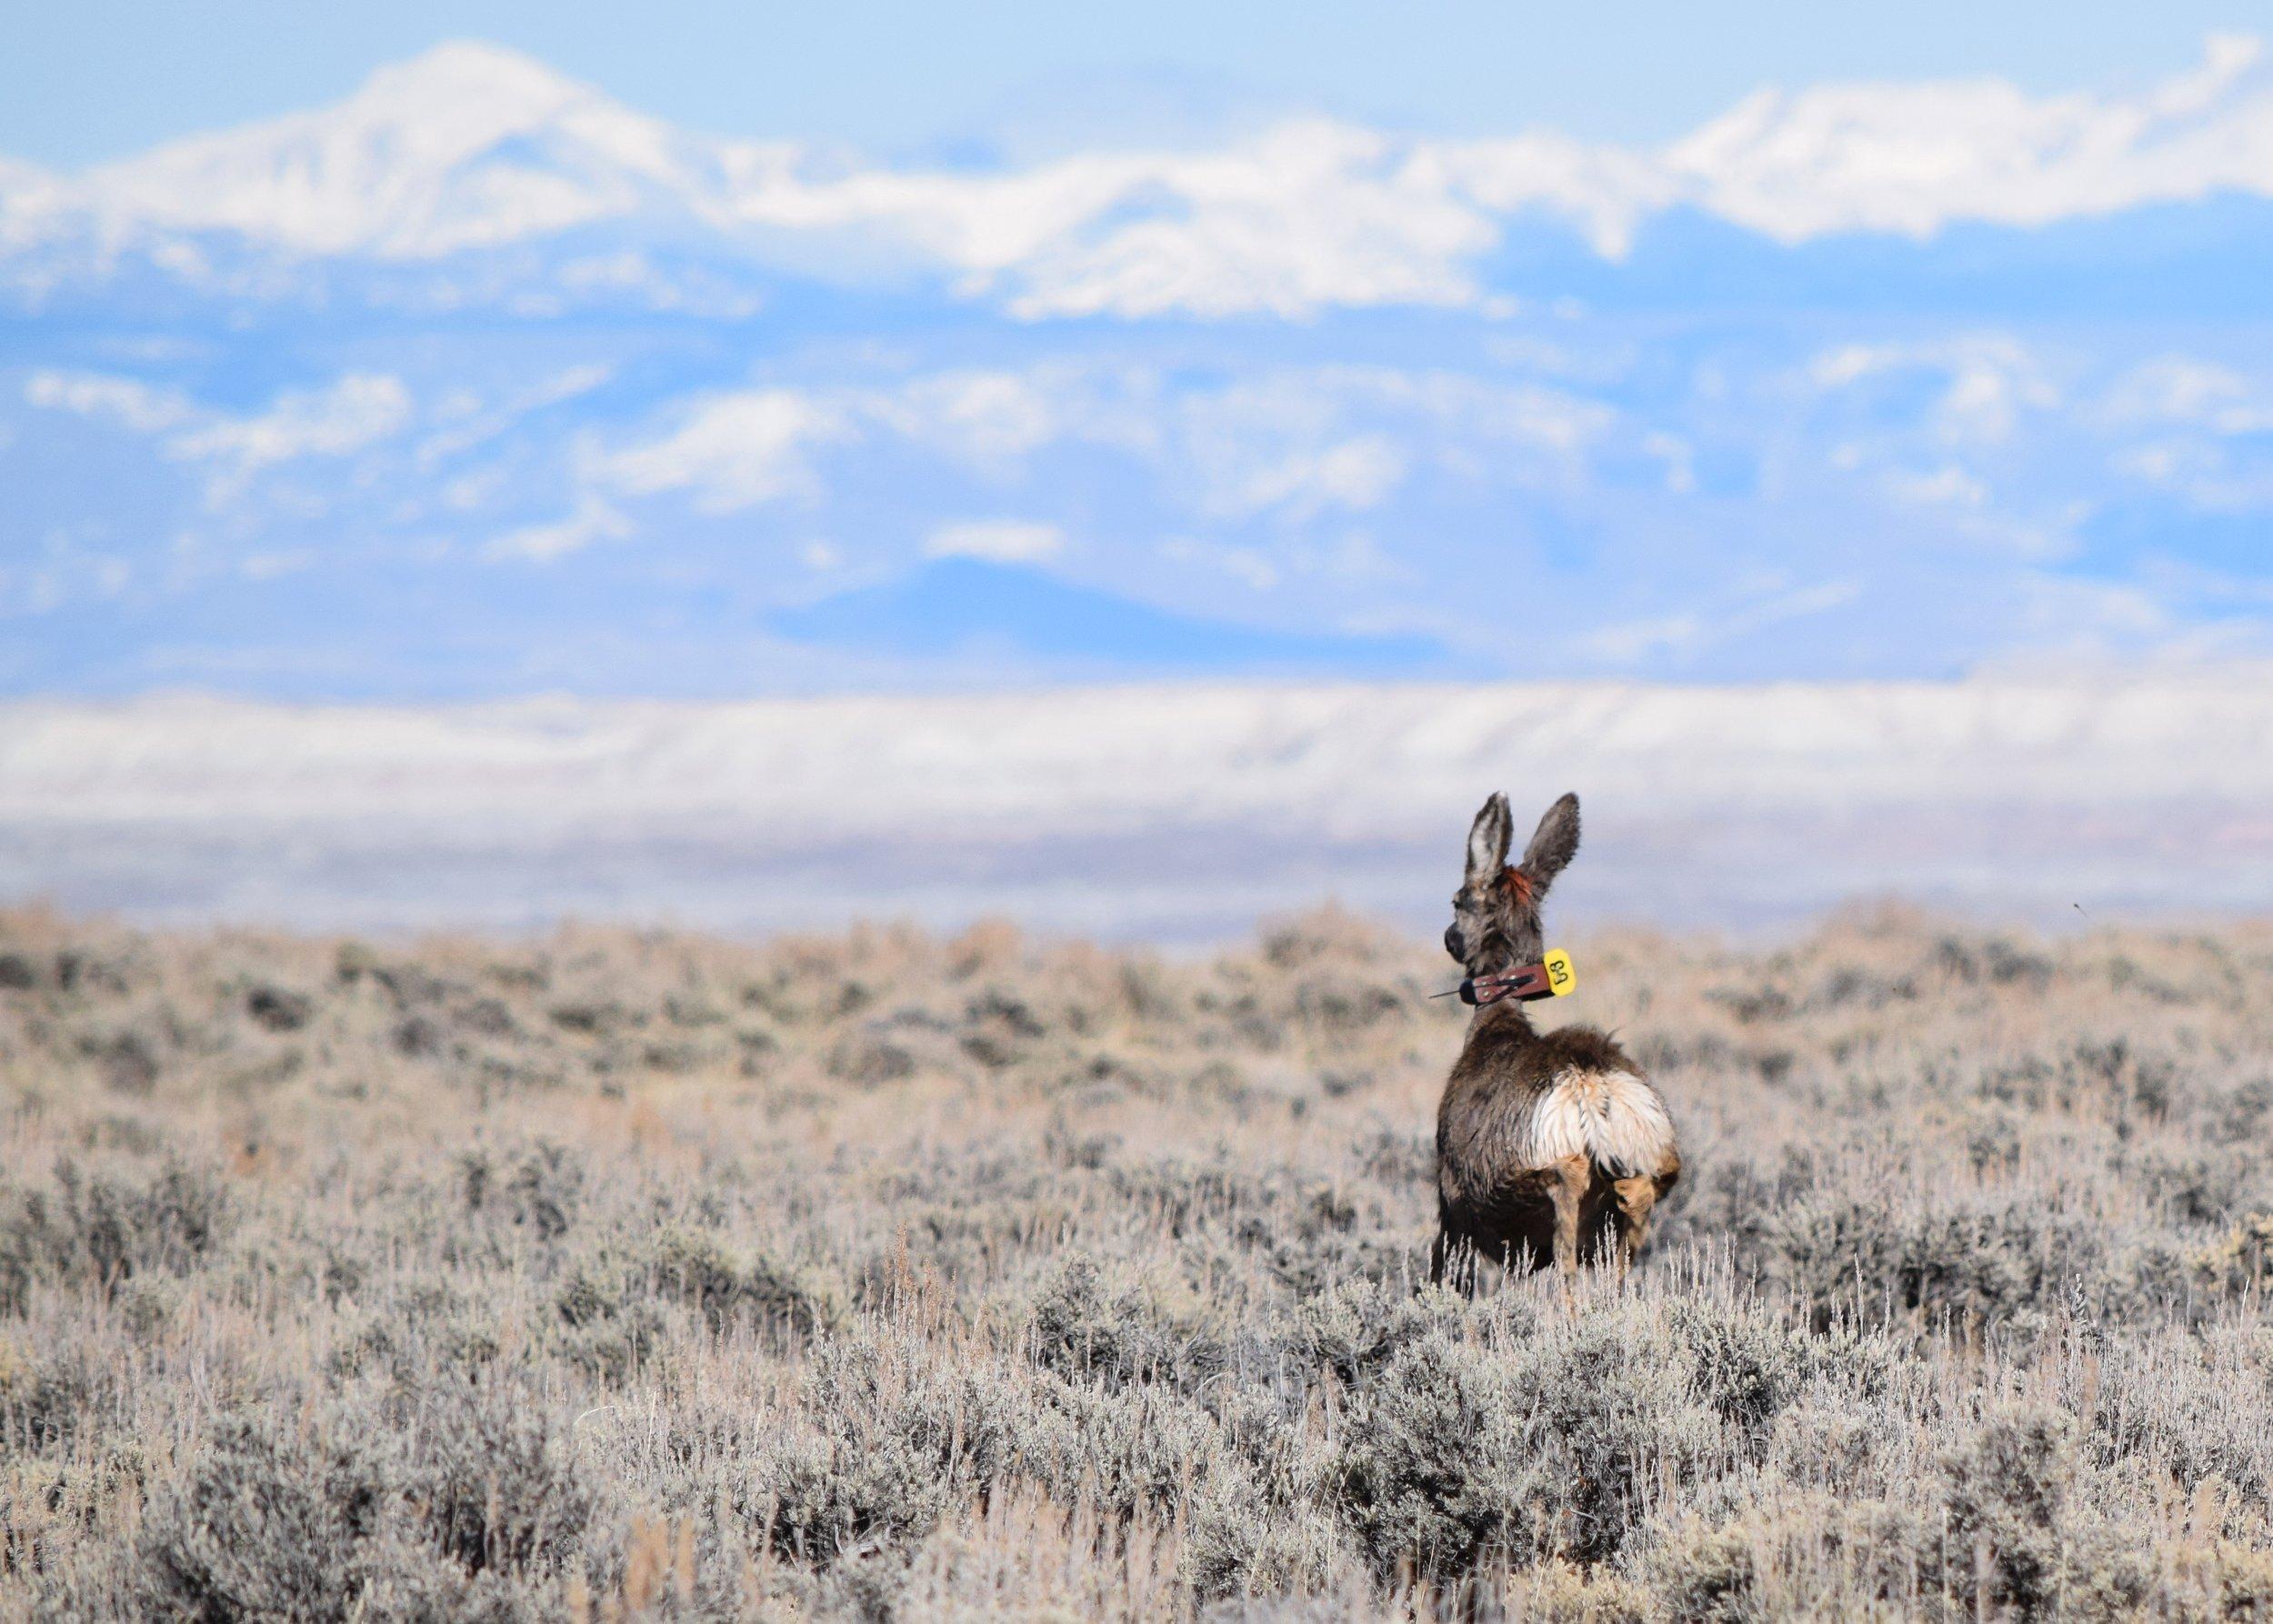 Photo courtesy of Deer 139.